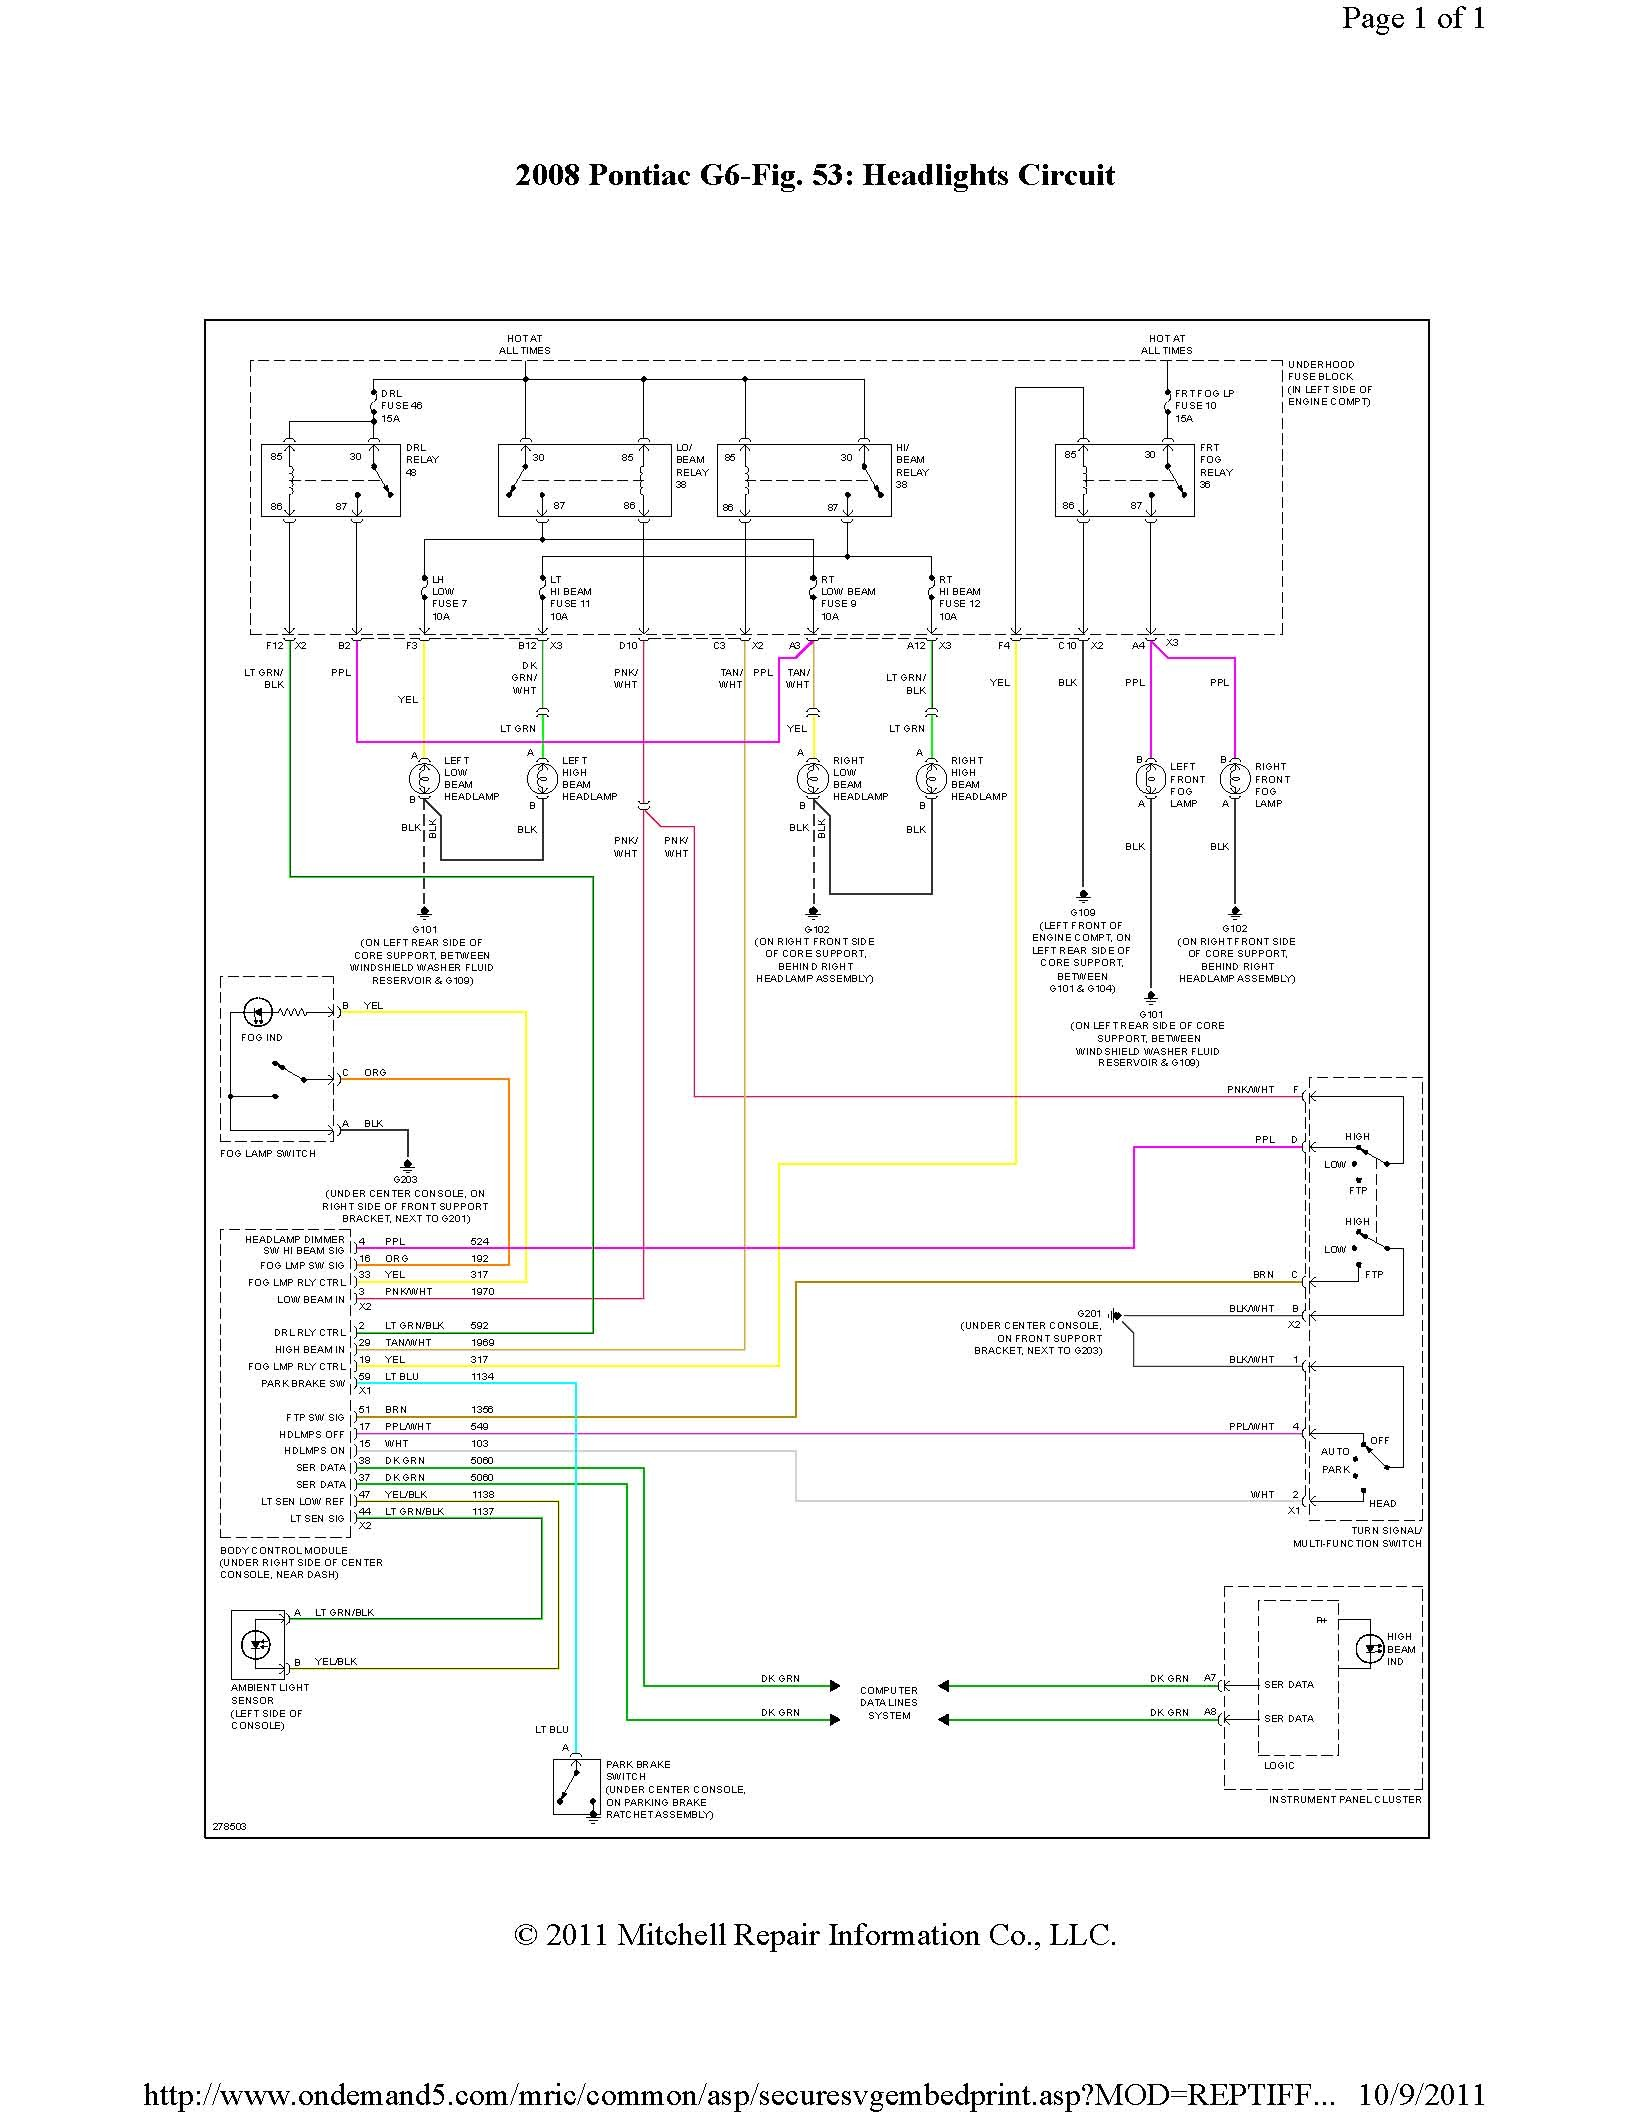 05 pontiac g6 wiring diagram - wiring diagram schematic 2008 pontiac g6 wiring diagram 2006 pontiac g6 radio wiring diagram 12mr-anitra.de